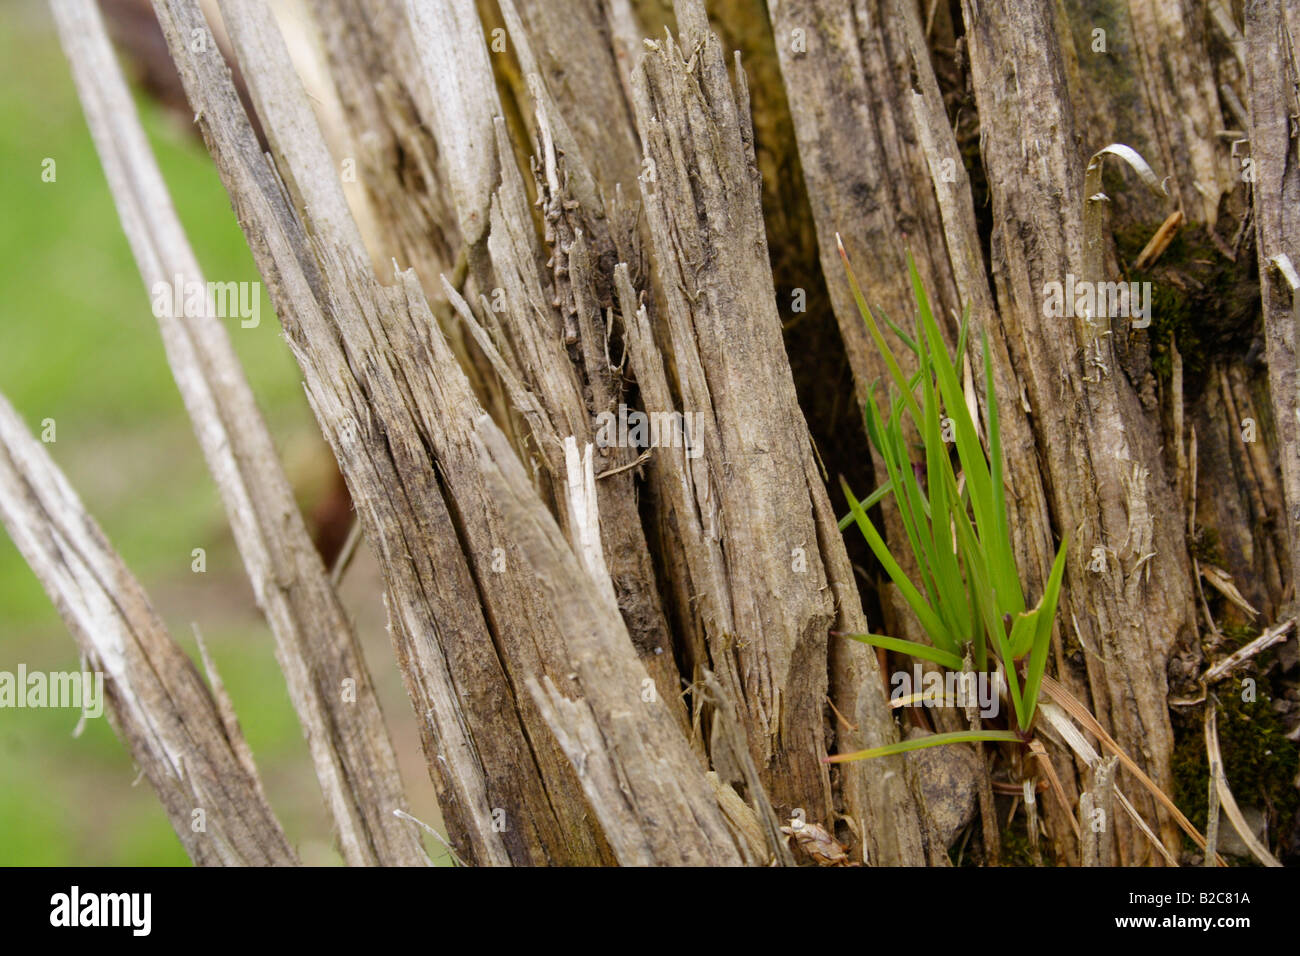 New habitat being settled, Lueerwald Forest, Sauerland, North Rhine-Westphalia, Germany, Europe Stock Photo